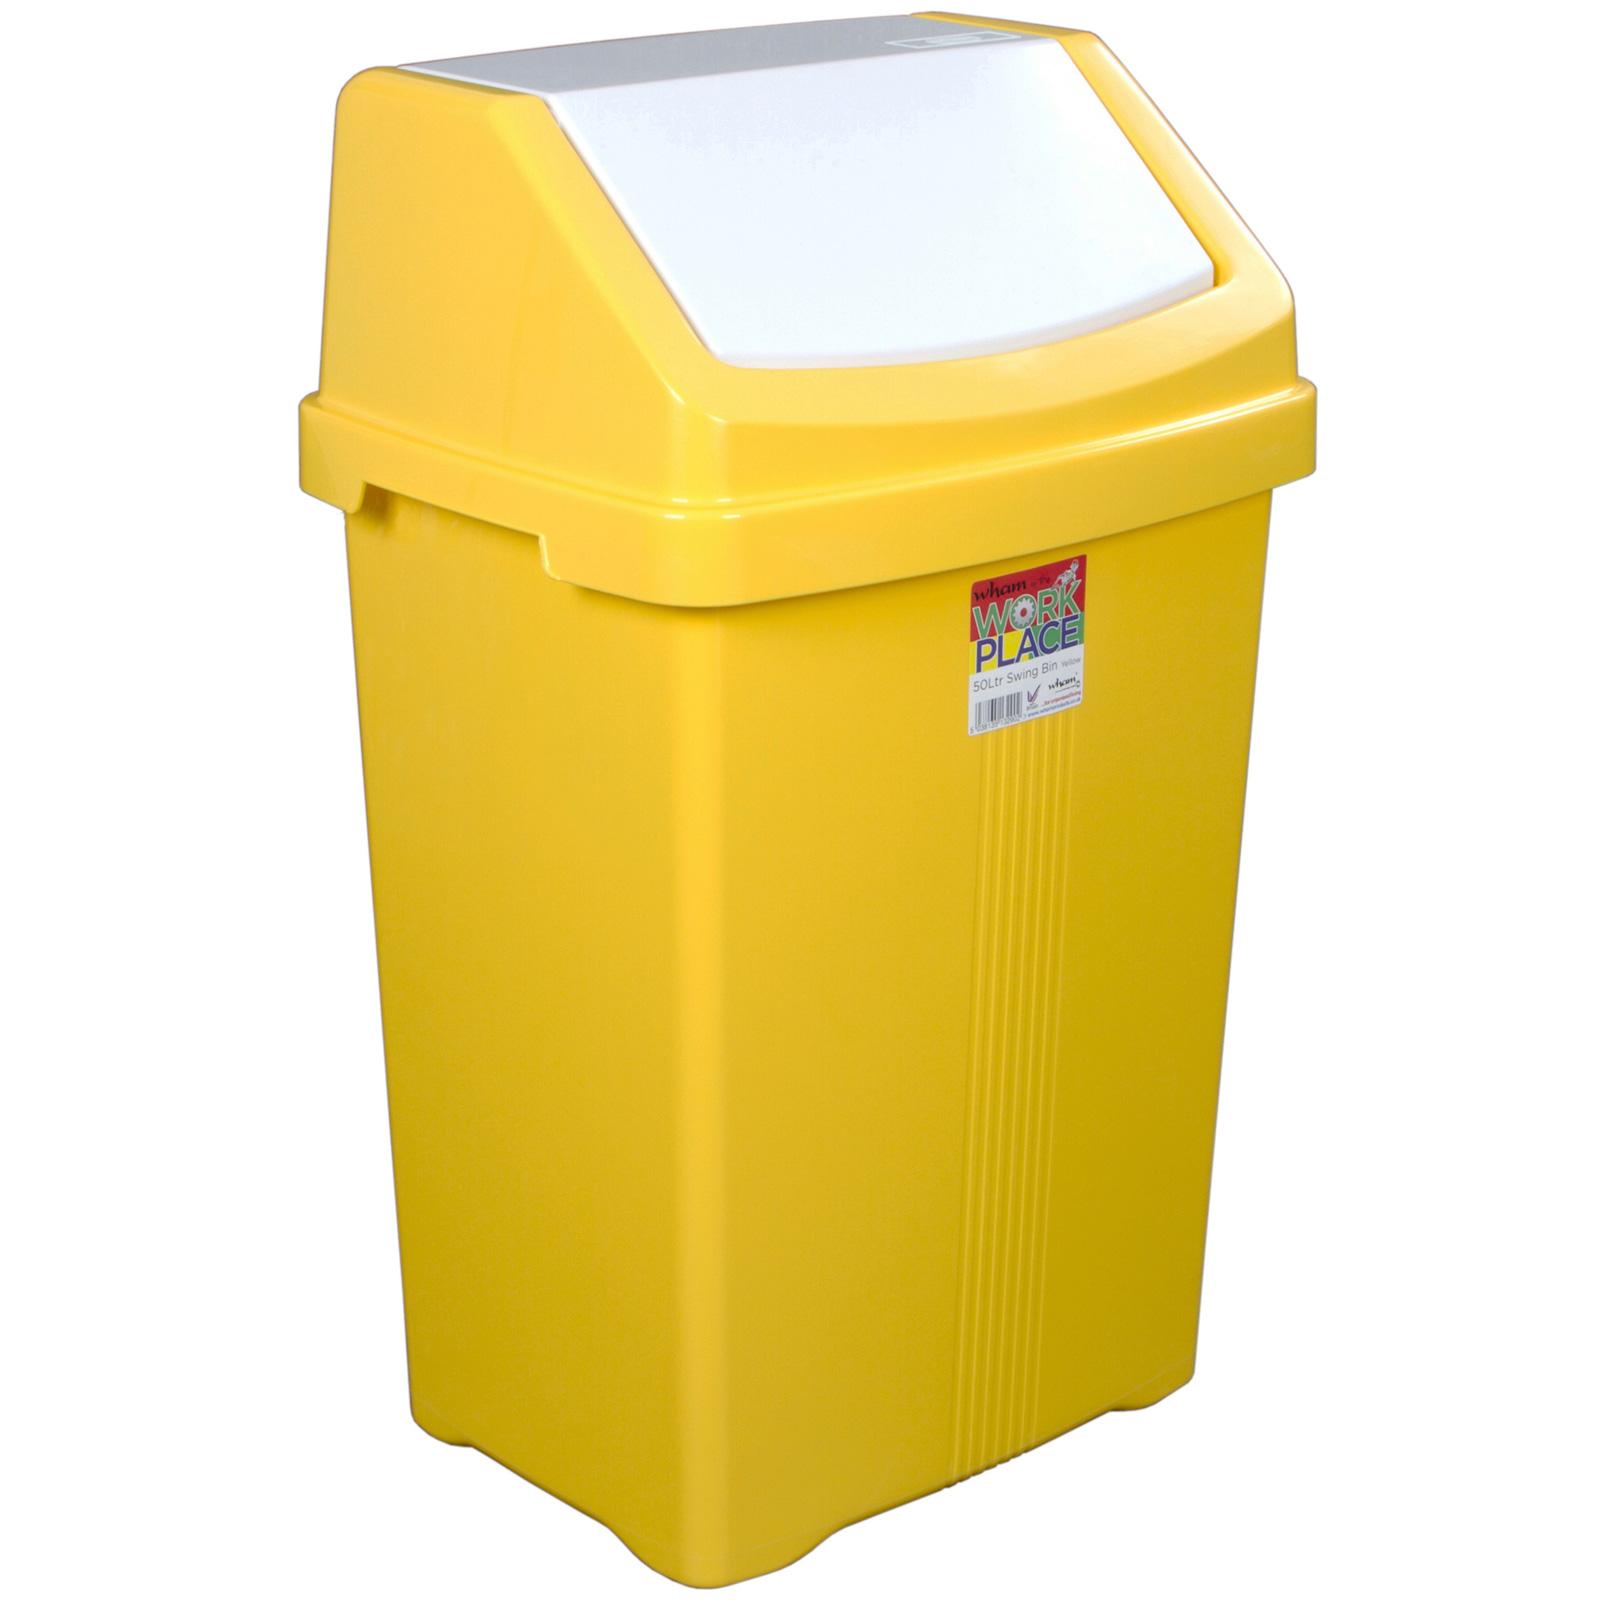 Muelleimer-Papierkorb-Abfalleimer-Abfallbehaelter-Muelltonne-Waeschetonne-Eimer